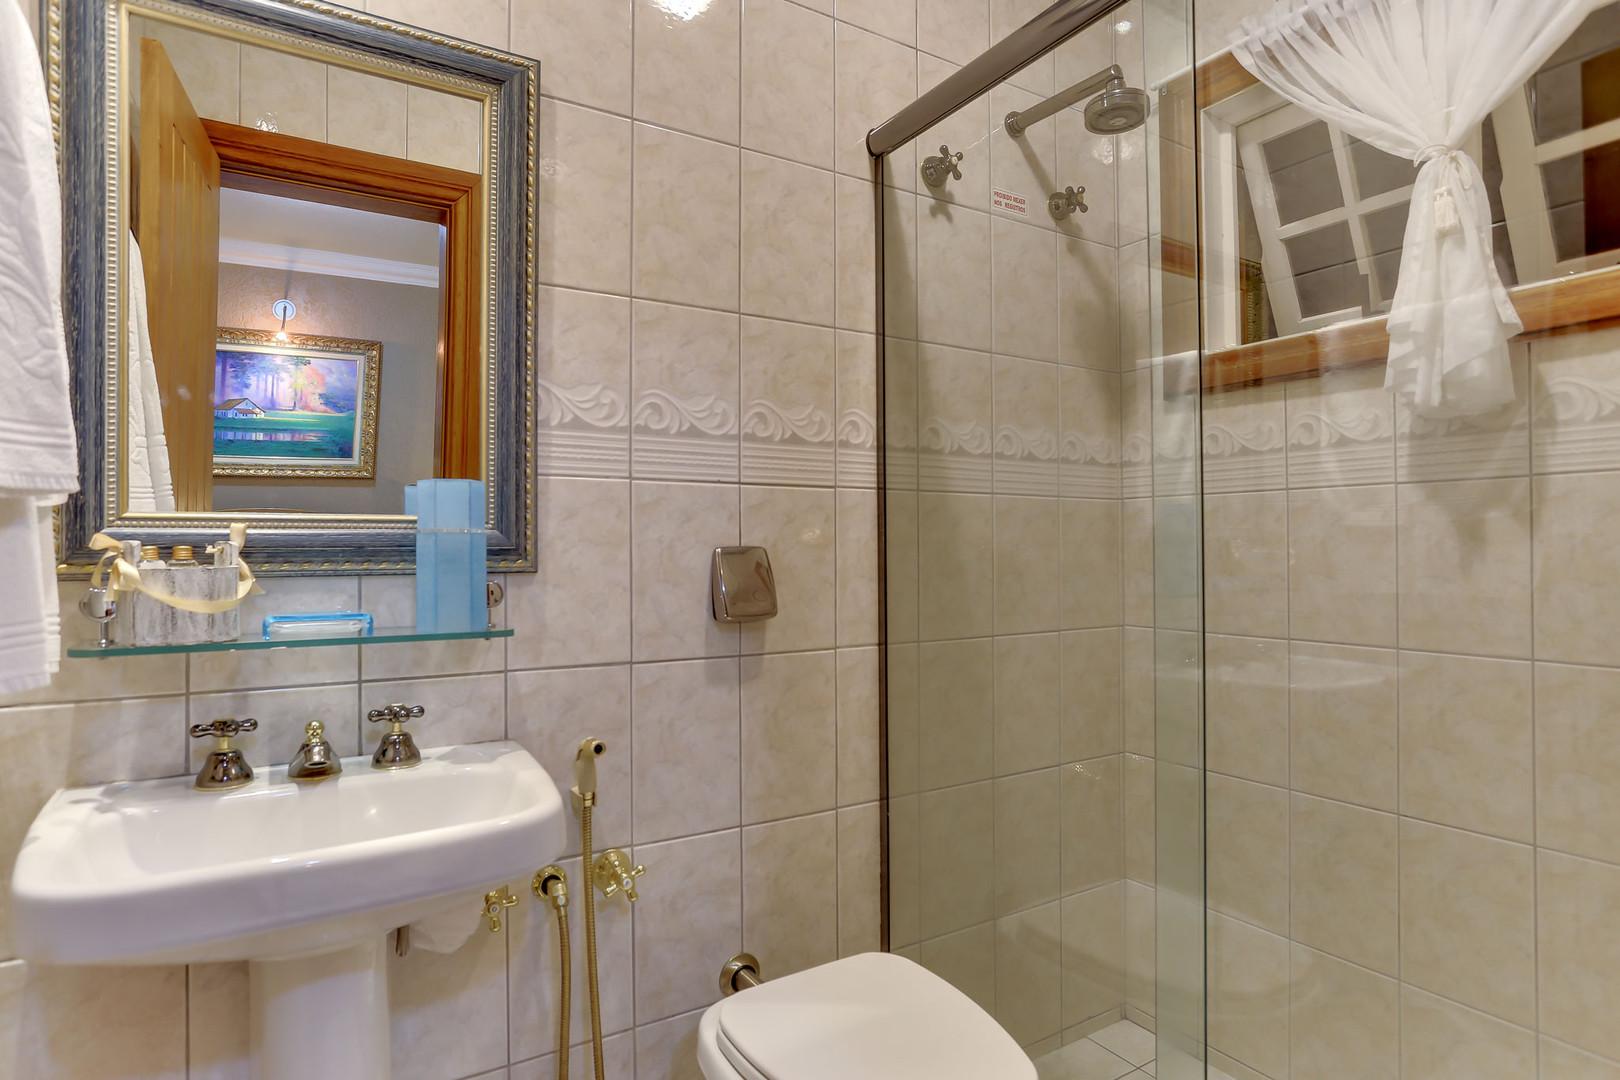 Banheiro - Apartamento LUXO